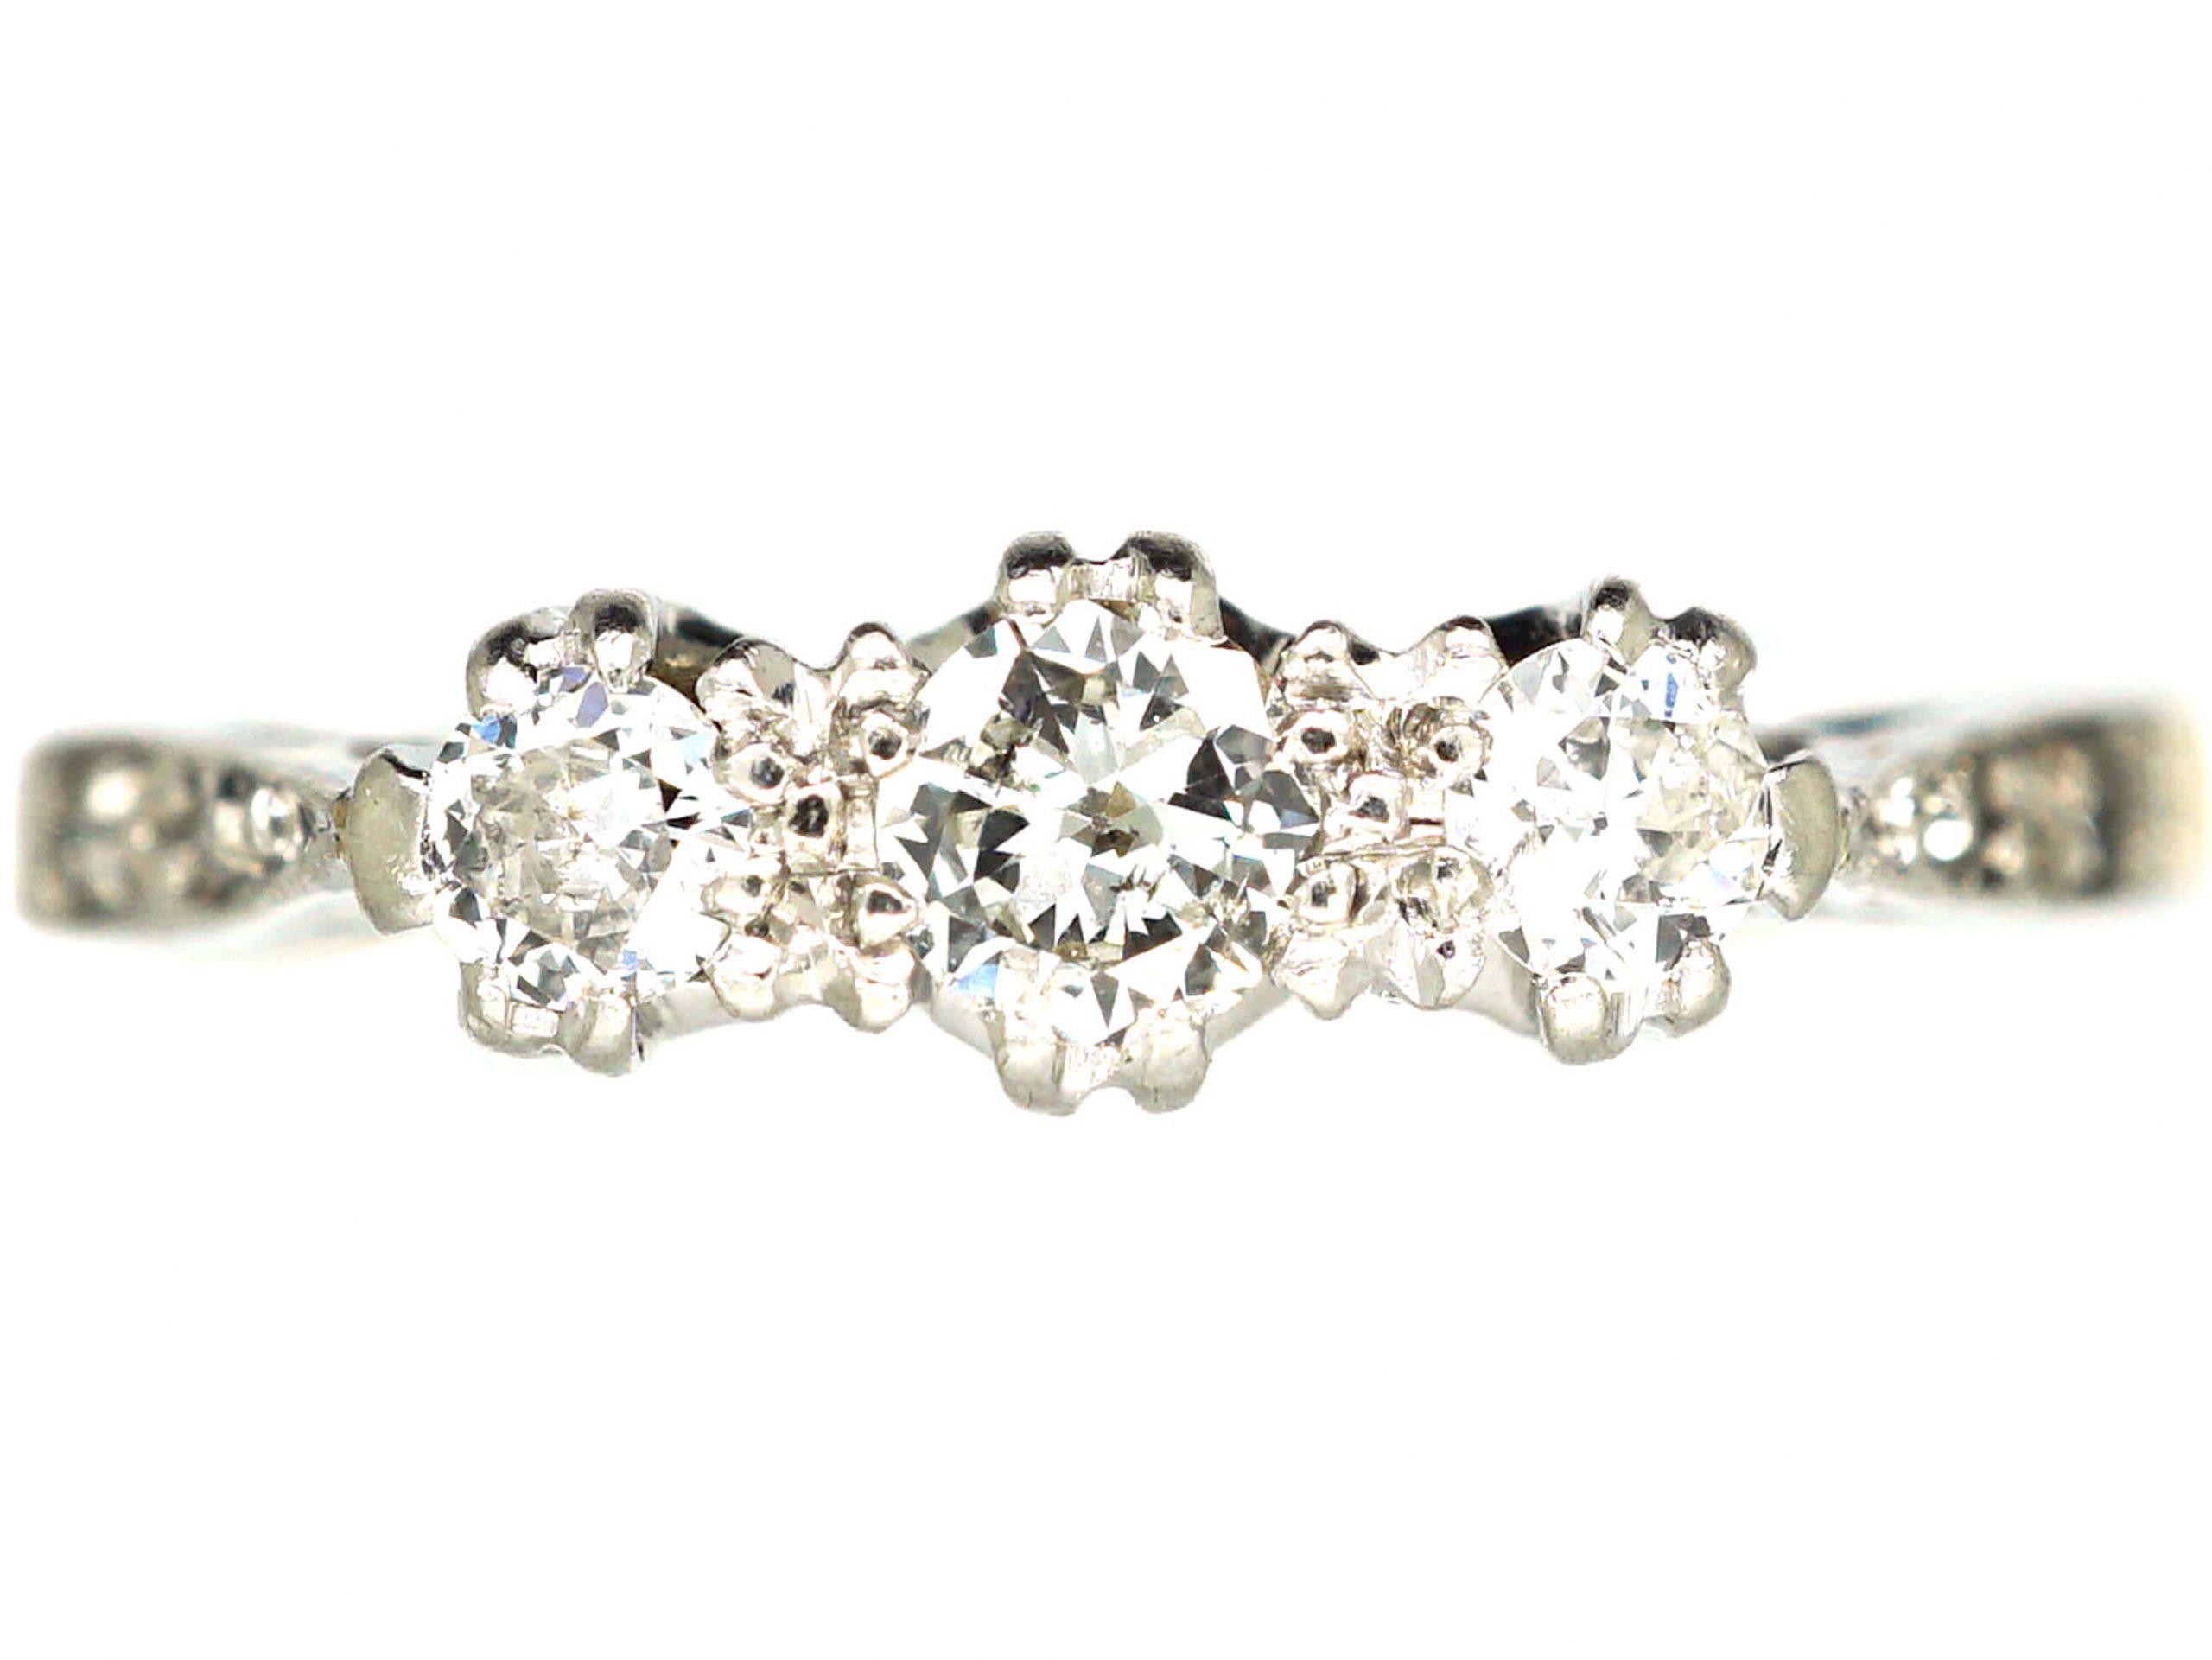 18ct Gold & Platinum, Three Stone Diamond Ring with Diamond Set Shoulders